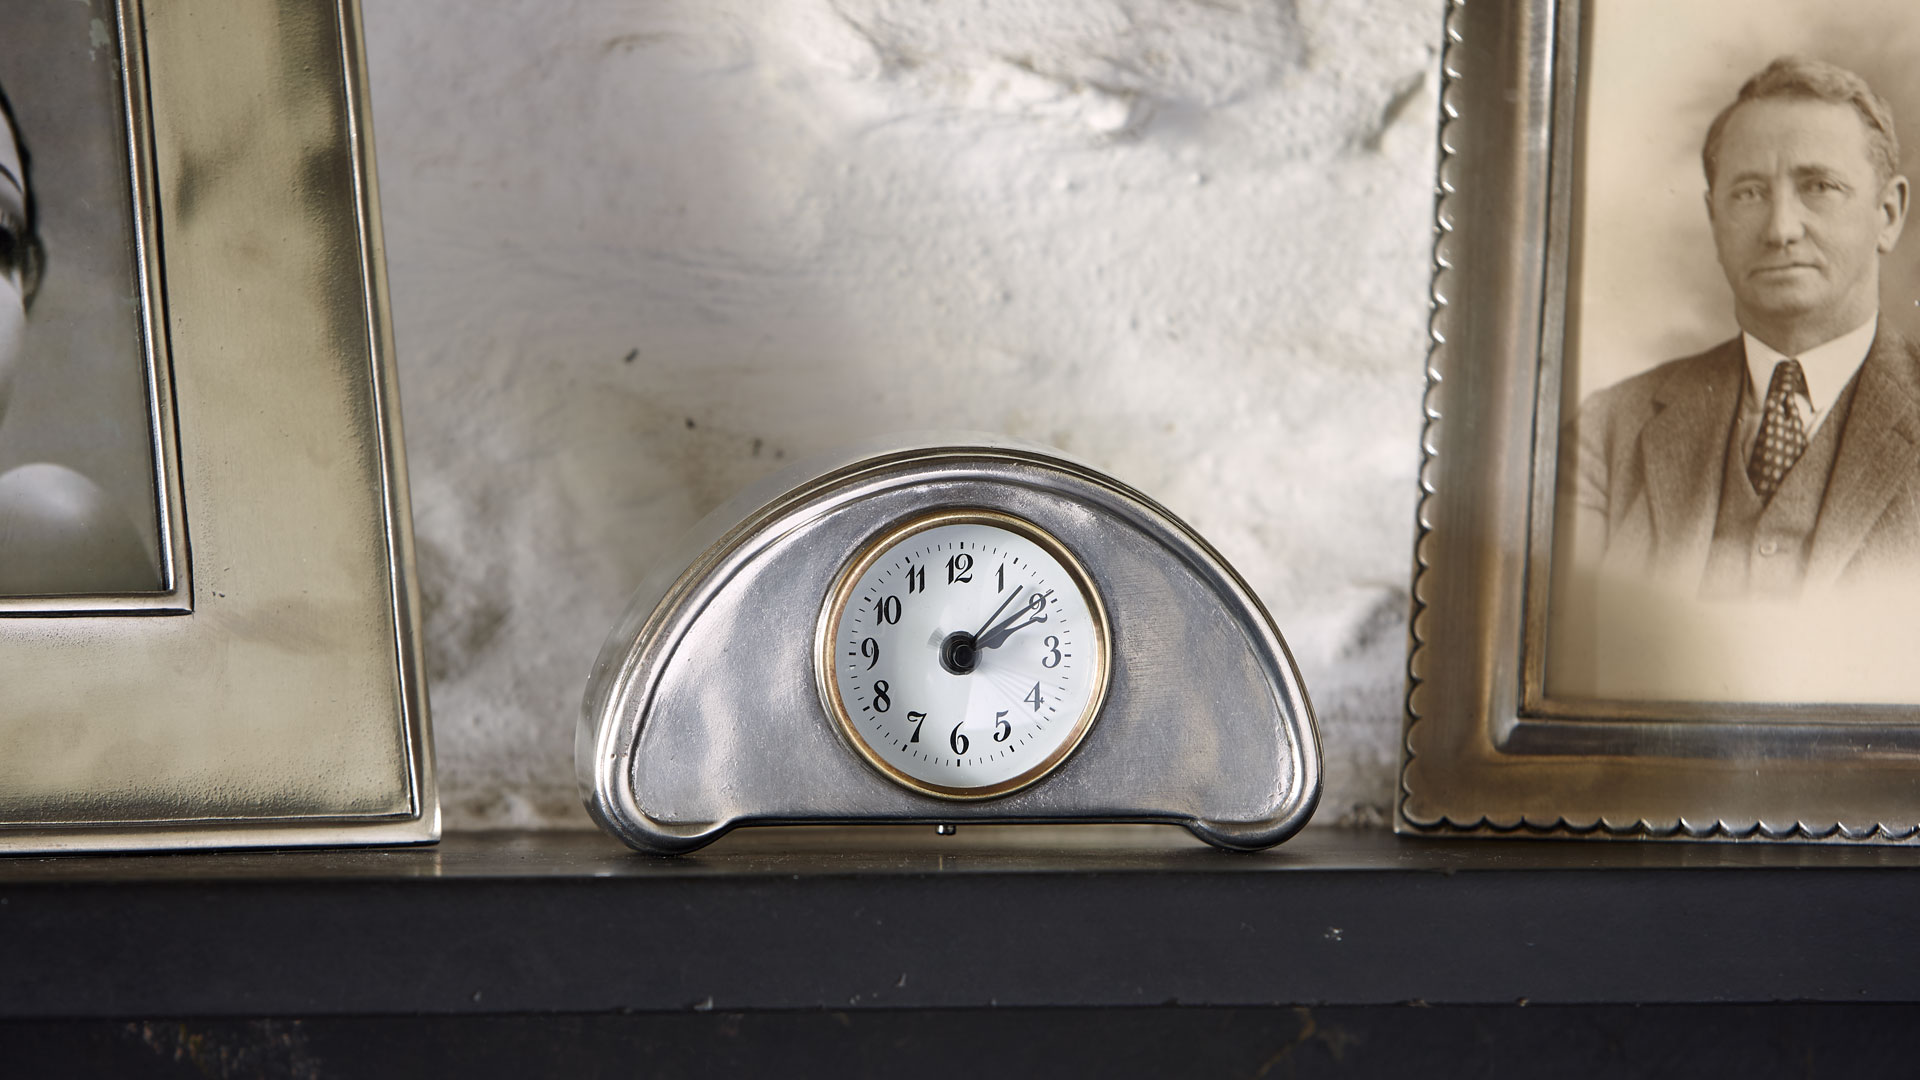 alarm wecker analog mit batterie grau zinn und glas cm 13x7 by cosi tabellini kollektion. Black Bedroom Furniture Sets. Home Design Ideas